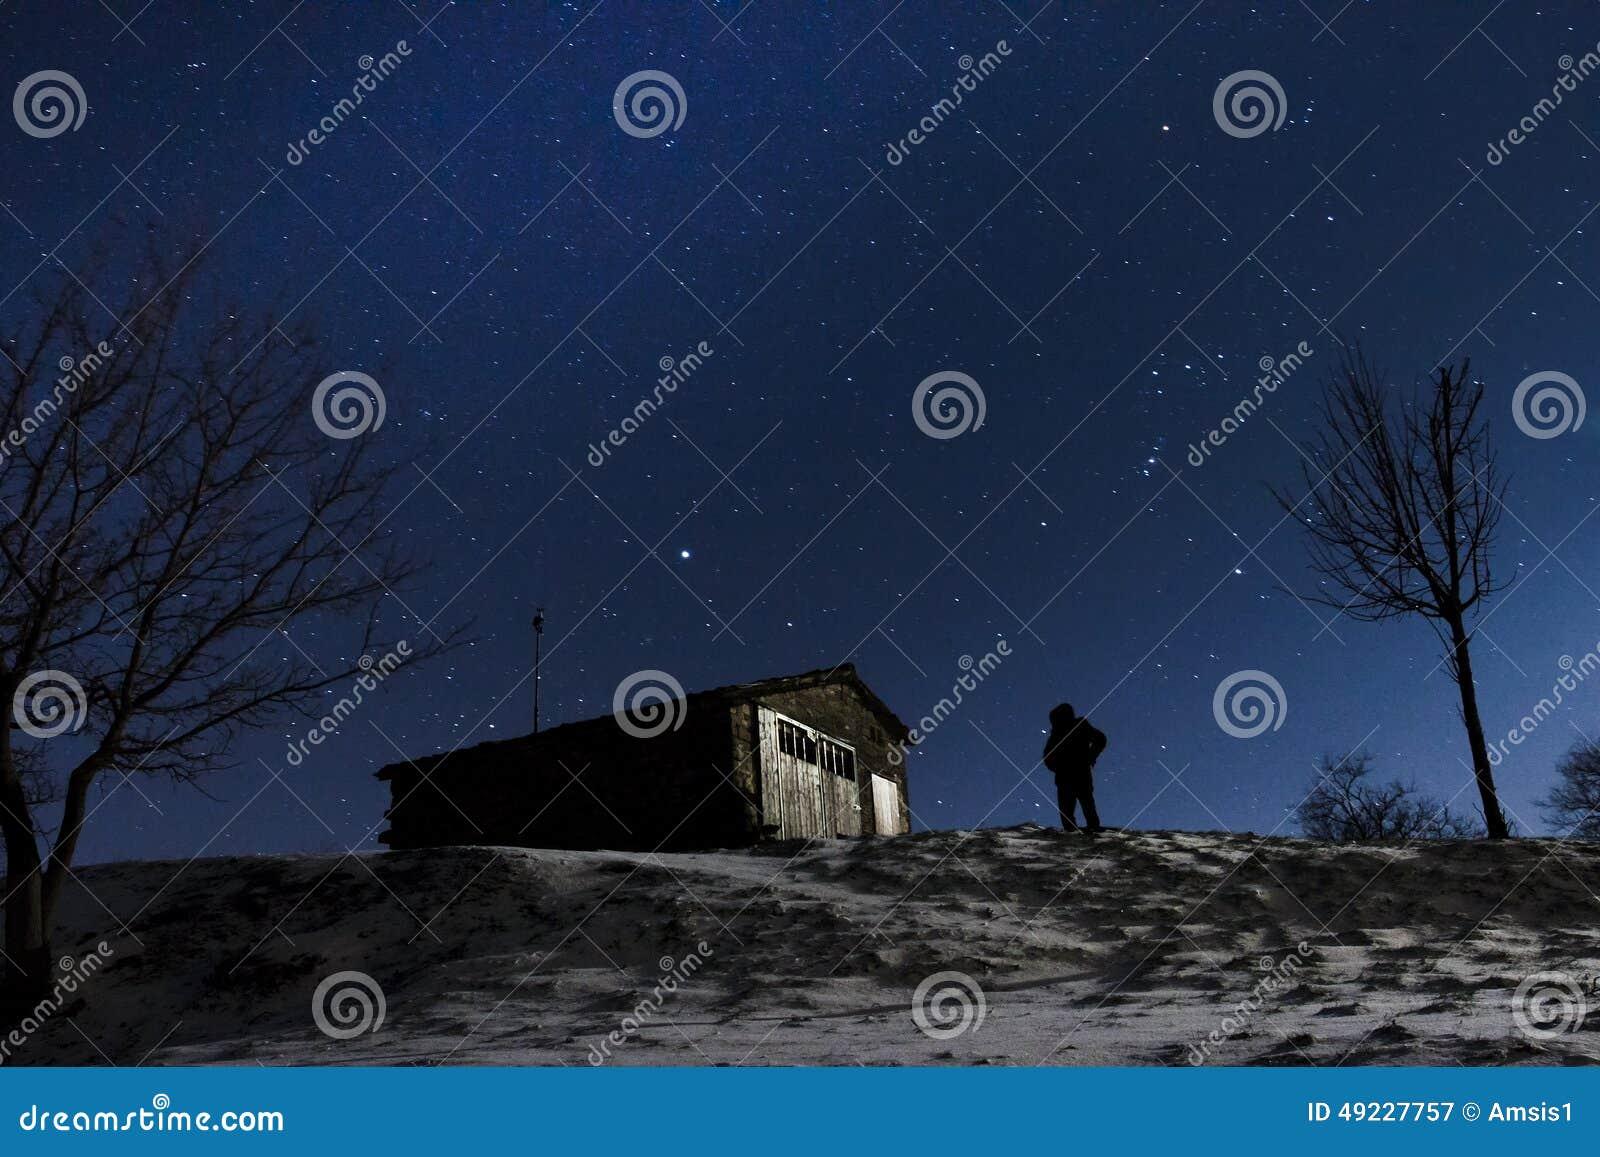 Stars night snow